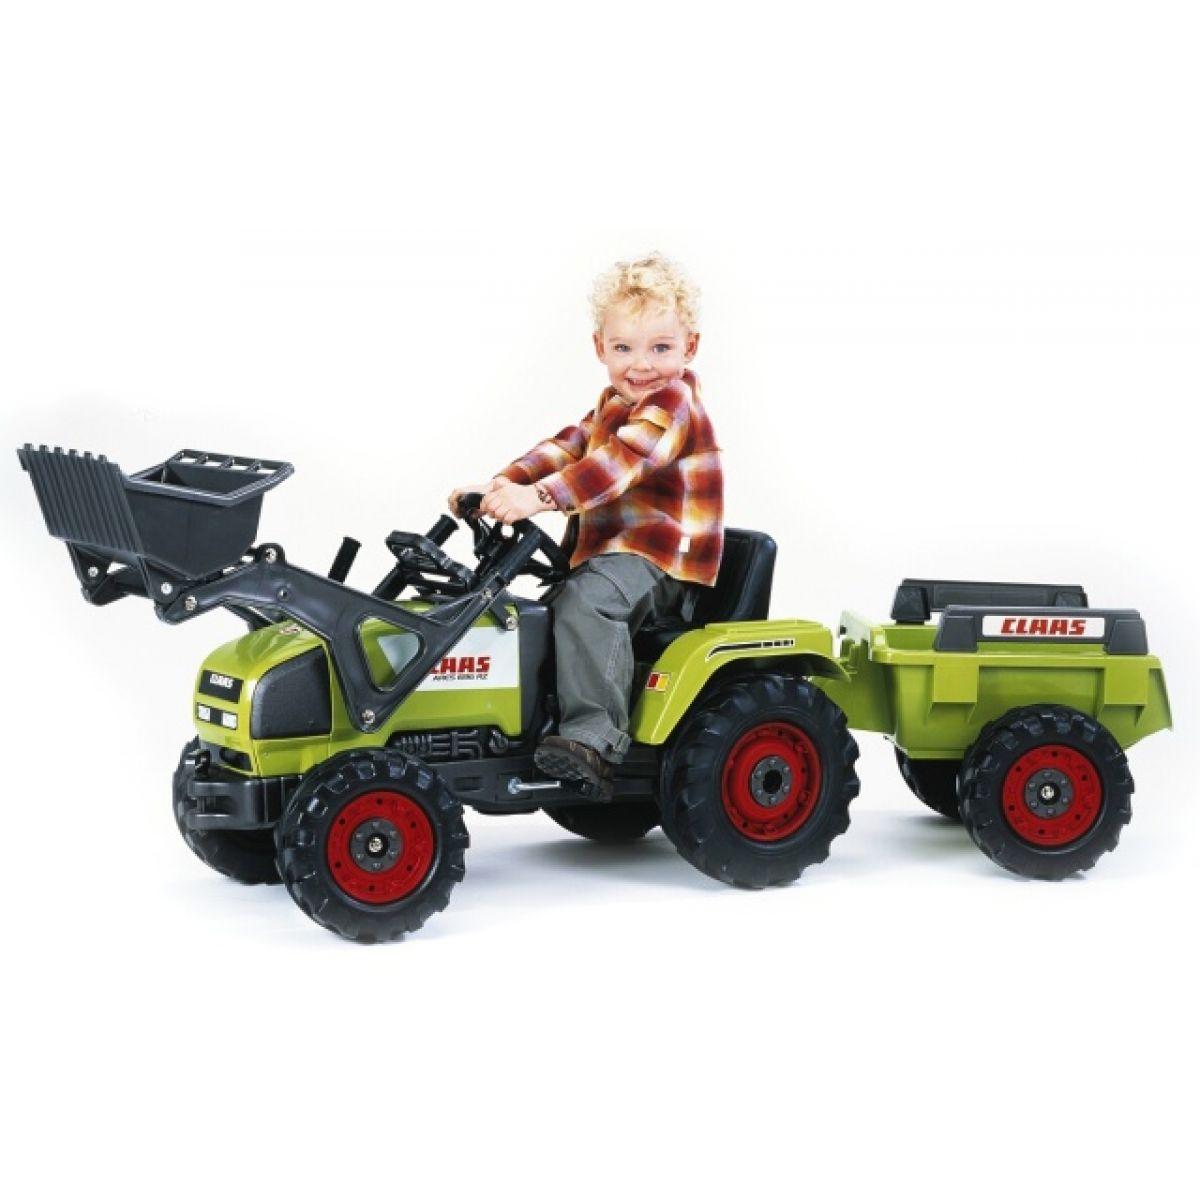 Šlapací traktor CLAAS Ares nakladač+přívěs zelený